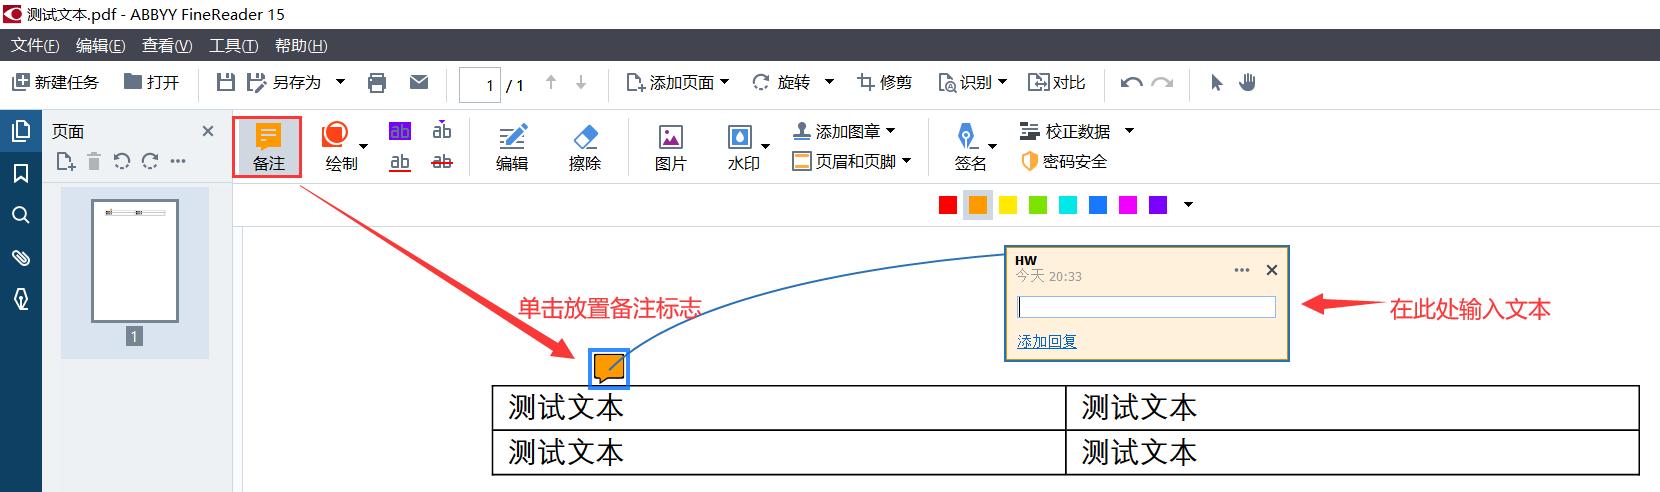 图二:使用ABBYY Finereader 15软件为PDF文档添加备注